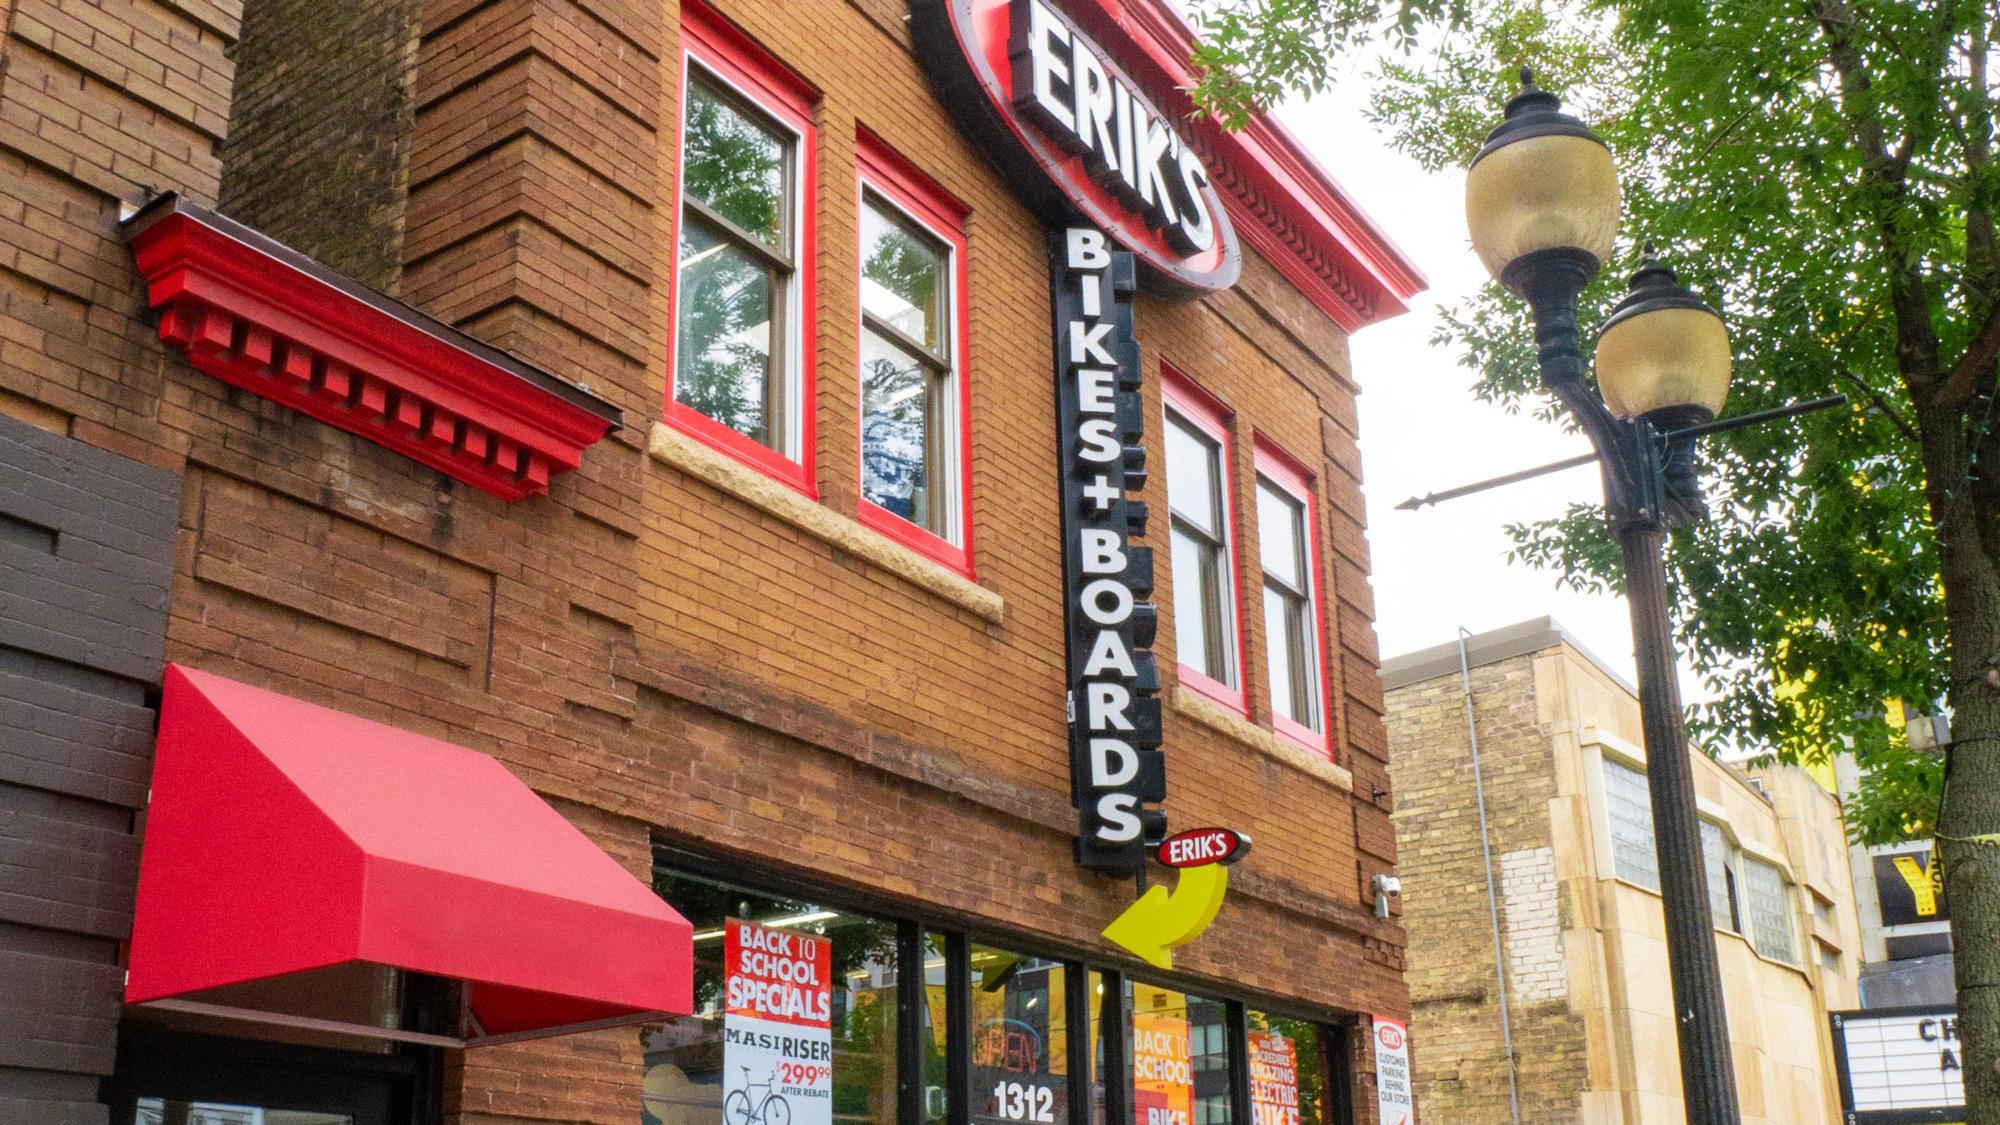 Minneapolis Dinkytown Eriks bike shop storefront